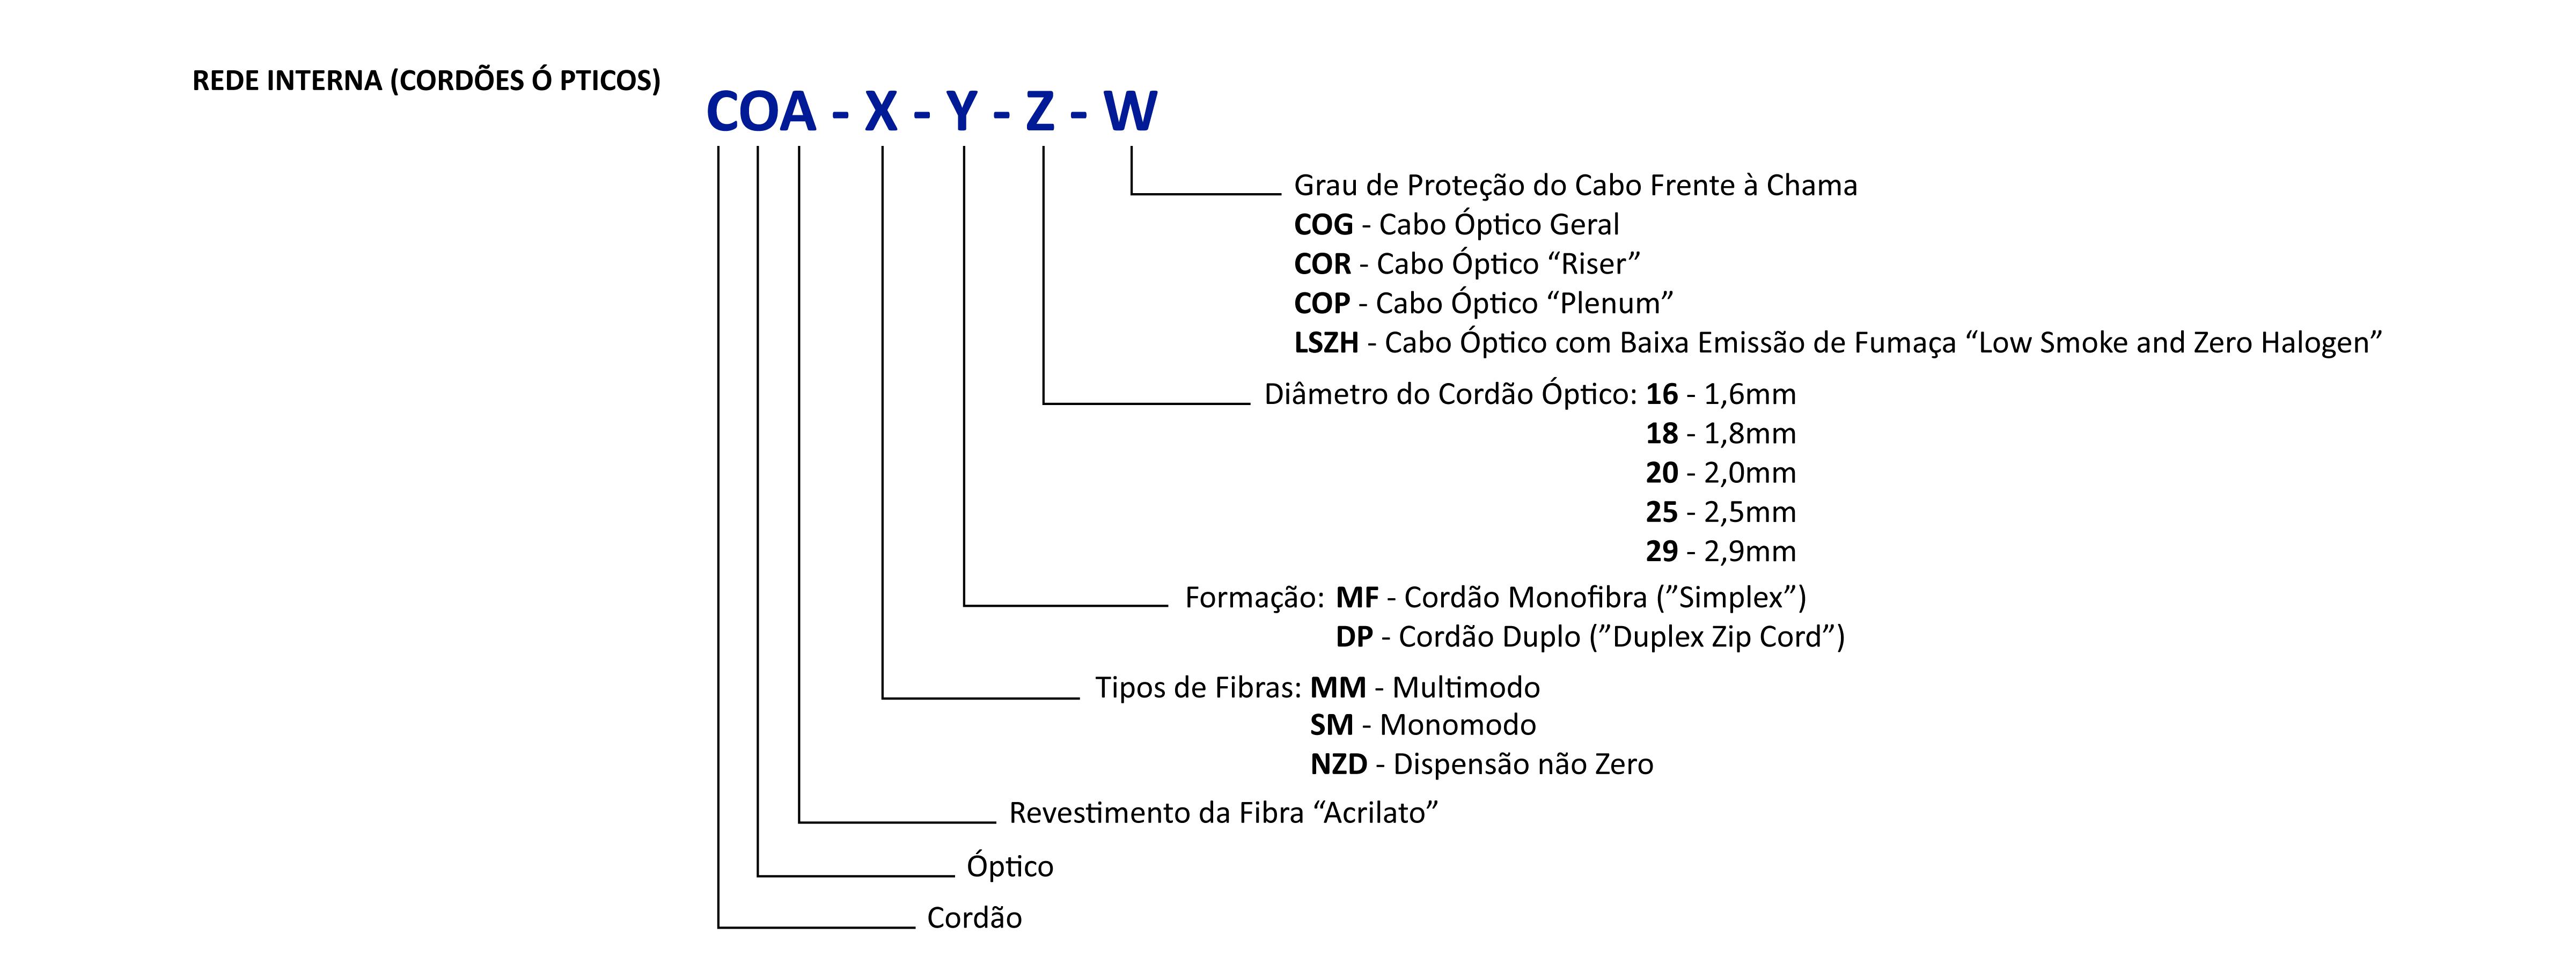 Nomenclaturas de cabos ópticos para rede interna/externa